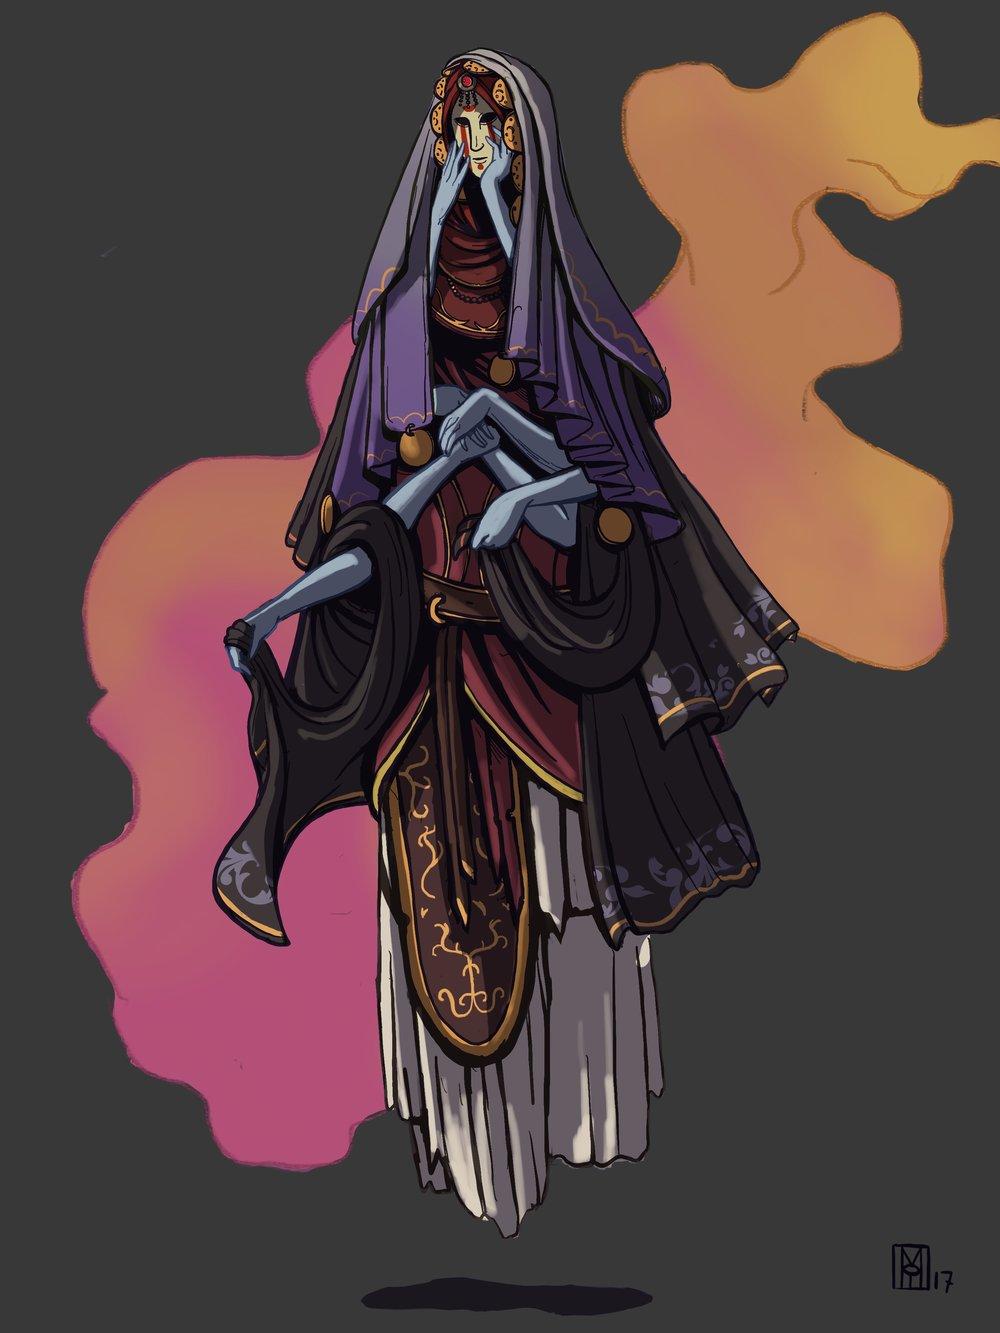 Character Design Challenge: Mask